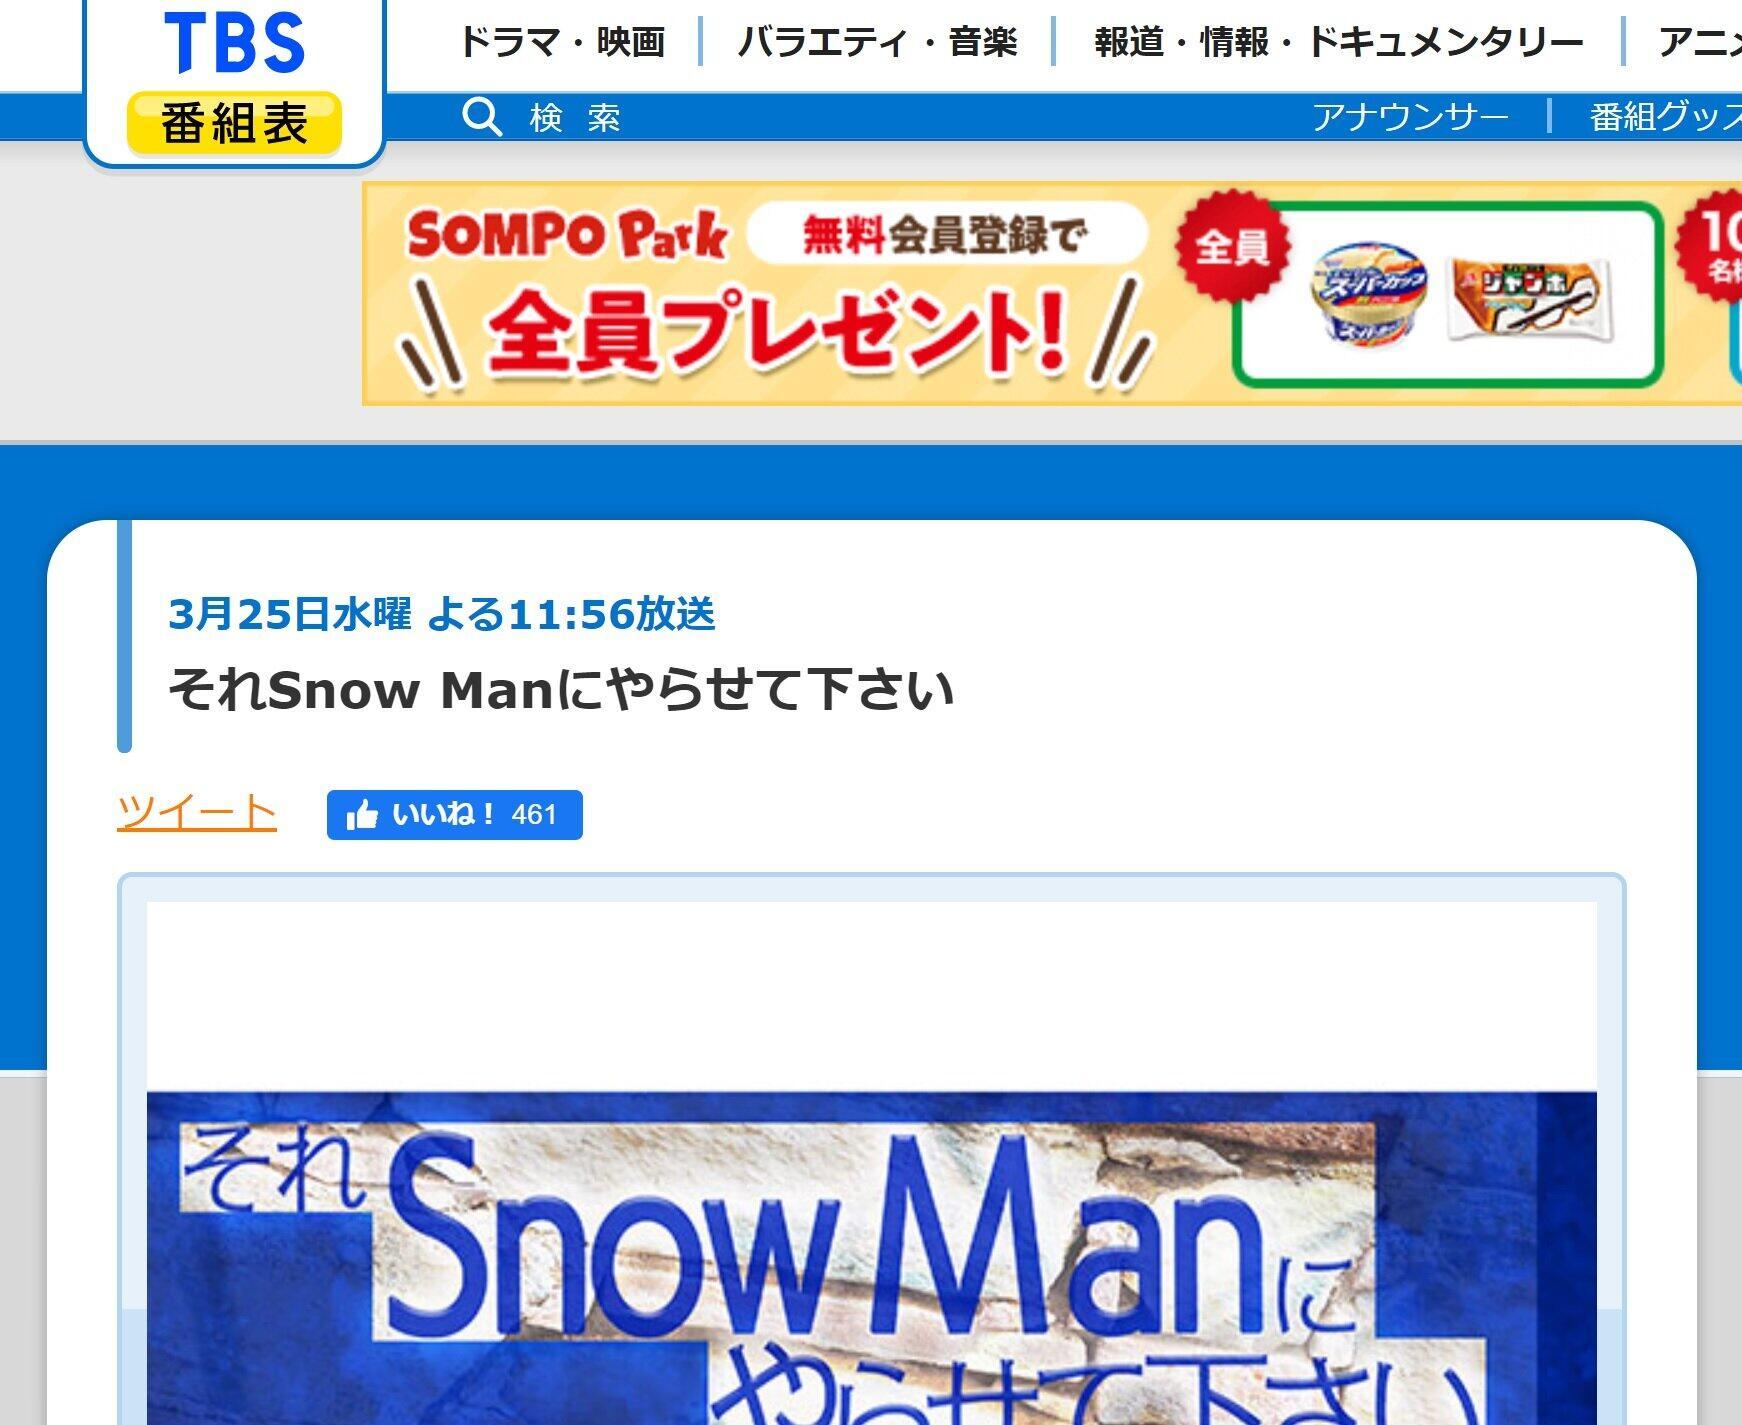 TBS系で放送された番組の公式サイト